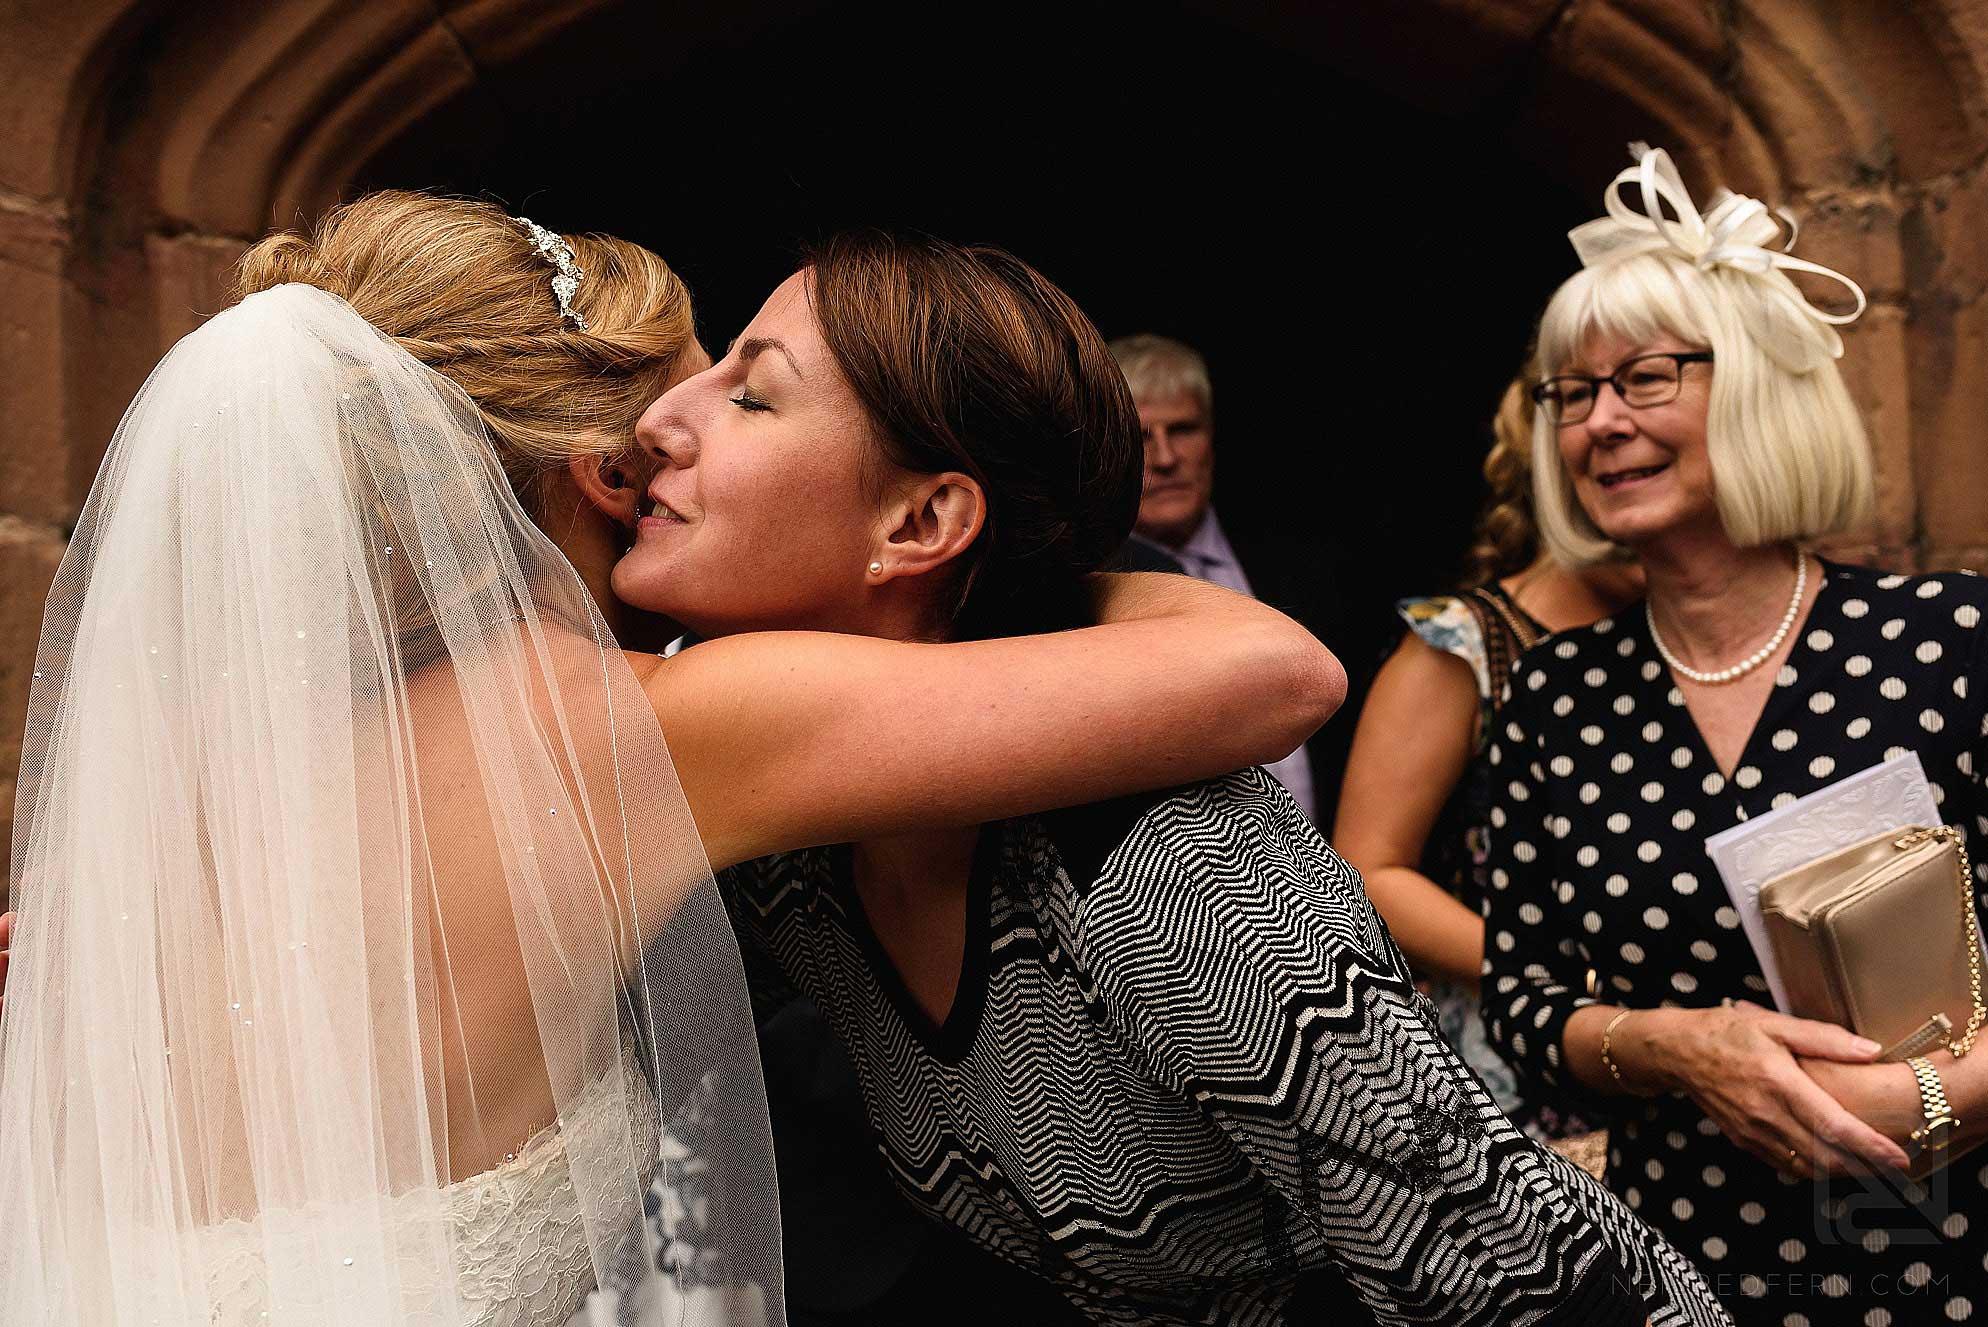 bride hugging friend outside church